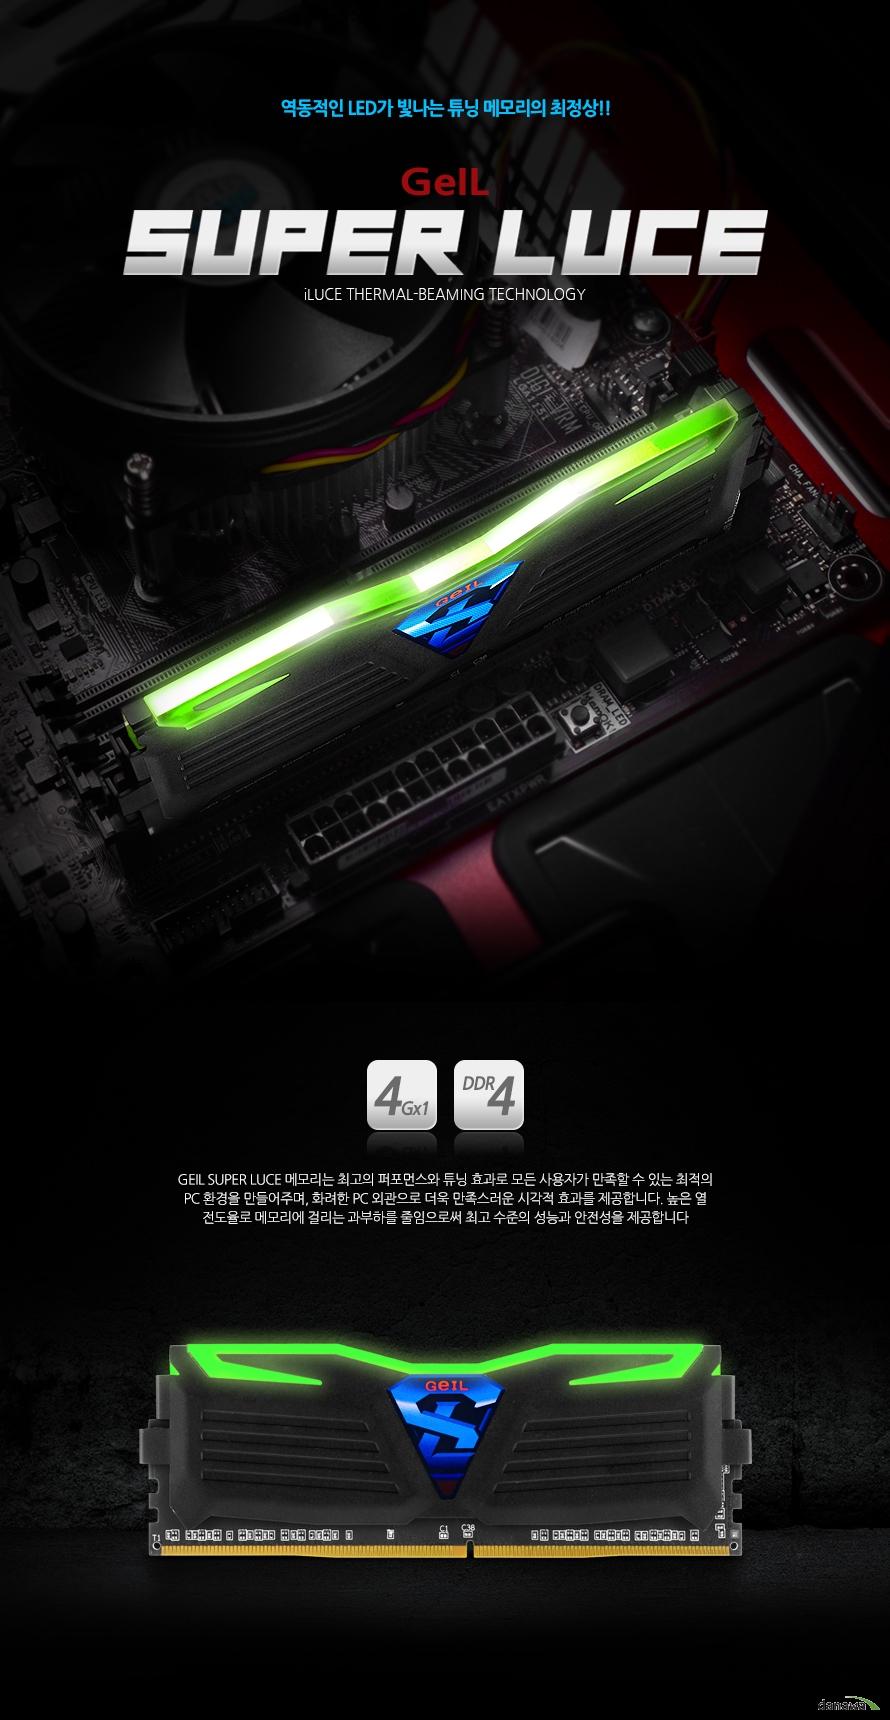 GeIL DDR4 4G PC4-17000 CL15 SUPER LUCE BLACK 그린 GEIL SUPER LUCE 메모리는 최고의 퍼포먼스와 튜닝 효과로 모든 사용자가 만족할 수 있는 최적의 PC 환경을 만들어주며, 화려한 PC 외관으로 더욱 만족스러운 시각적 효과를 제공합니다. 높은 열 전도율로 메모리에 걸리는 과부하를 줄임으로써 최고 수준의 성능과 안전성을 제공합니다